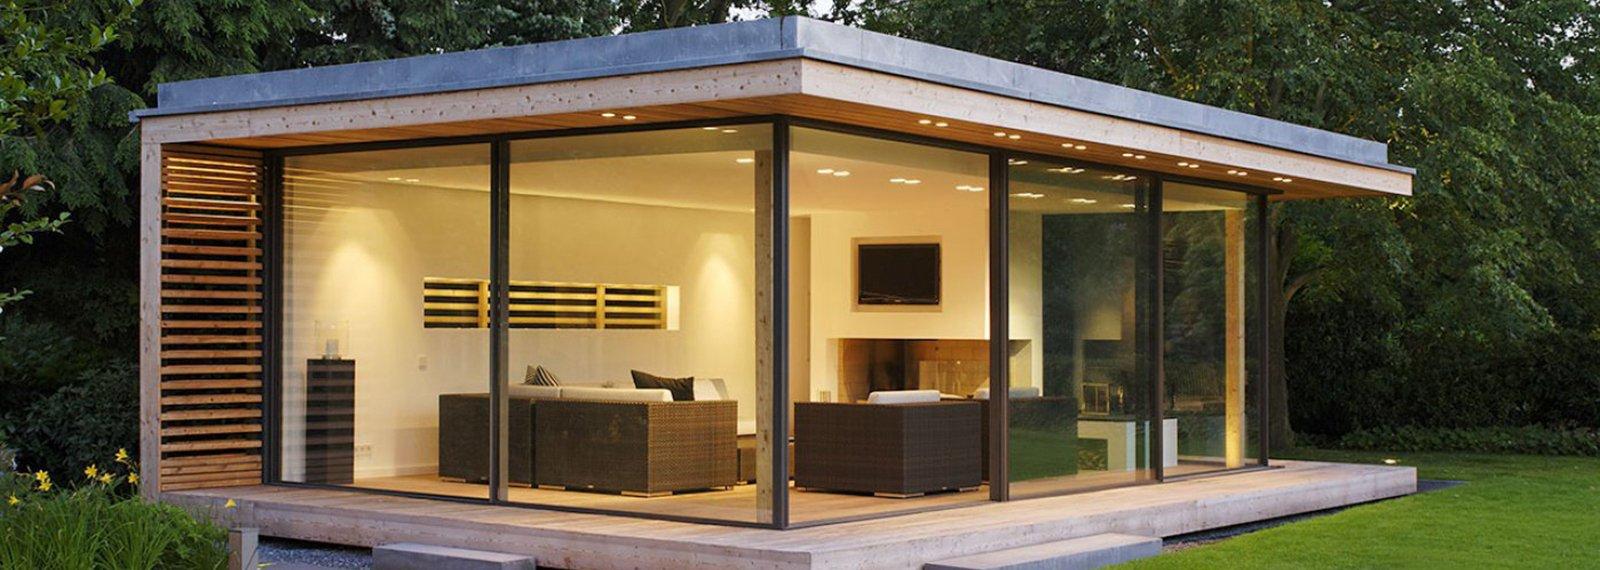 Studio De Jardin Bois Habitable Pool House Extension Maison à Studio Jardin Habitable